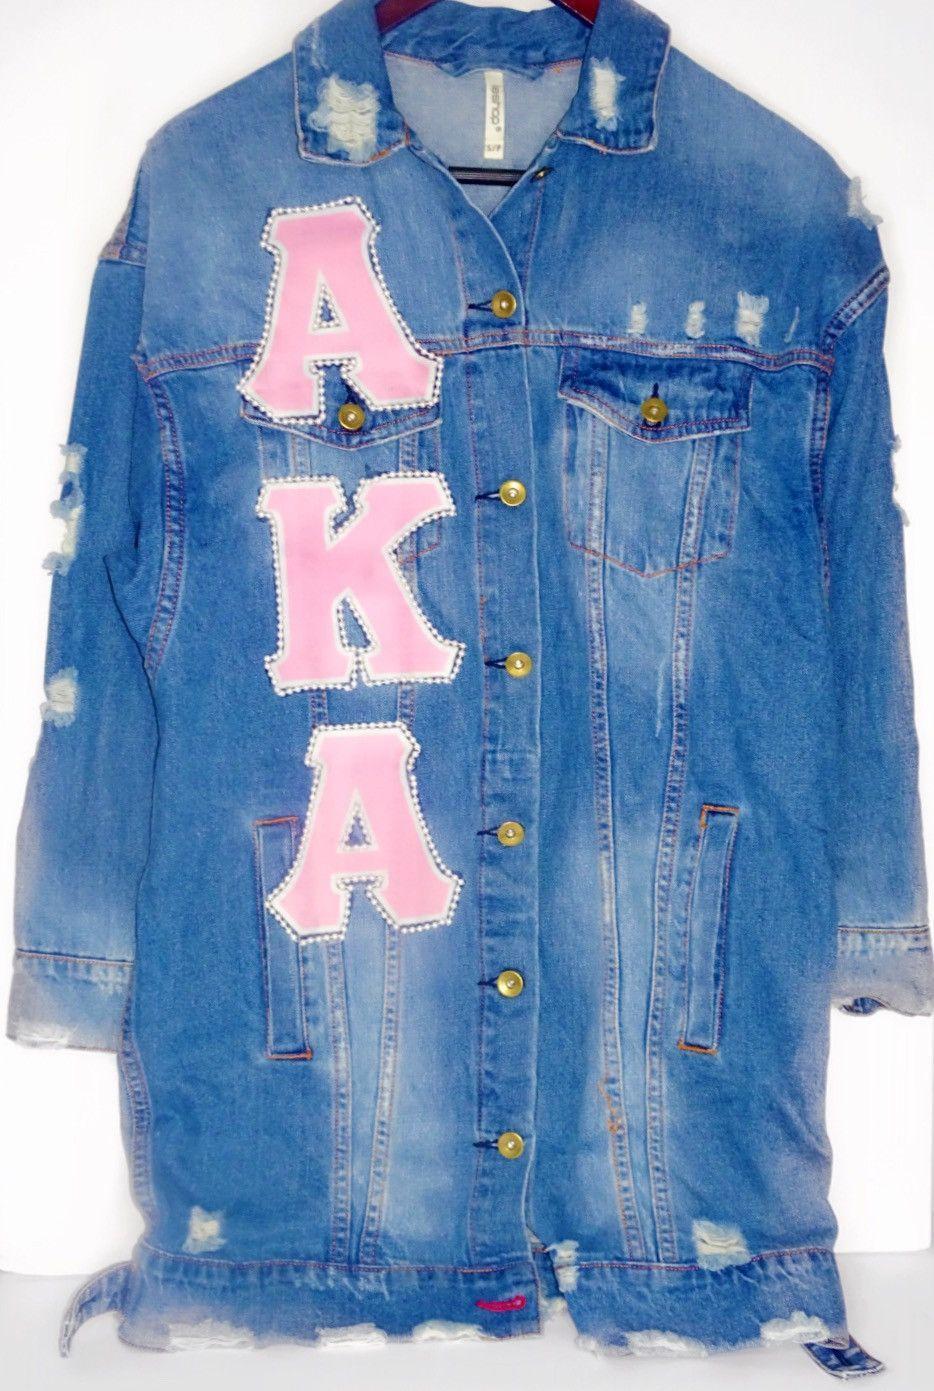 Oversized Pearl Denim Aka Jacket Pink Jackets Denim Trends Denim [ 1391 x 934 Pixel ]